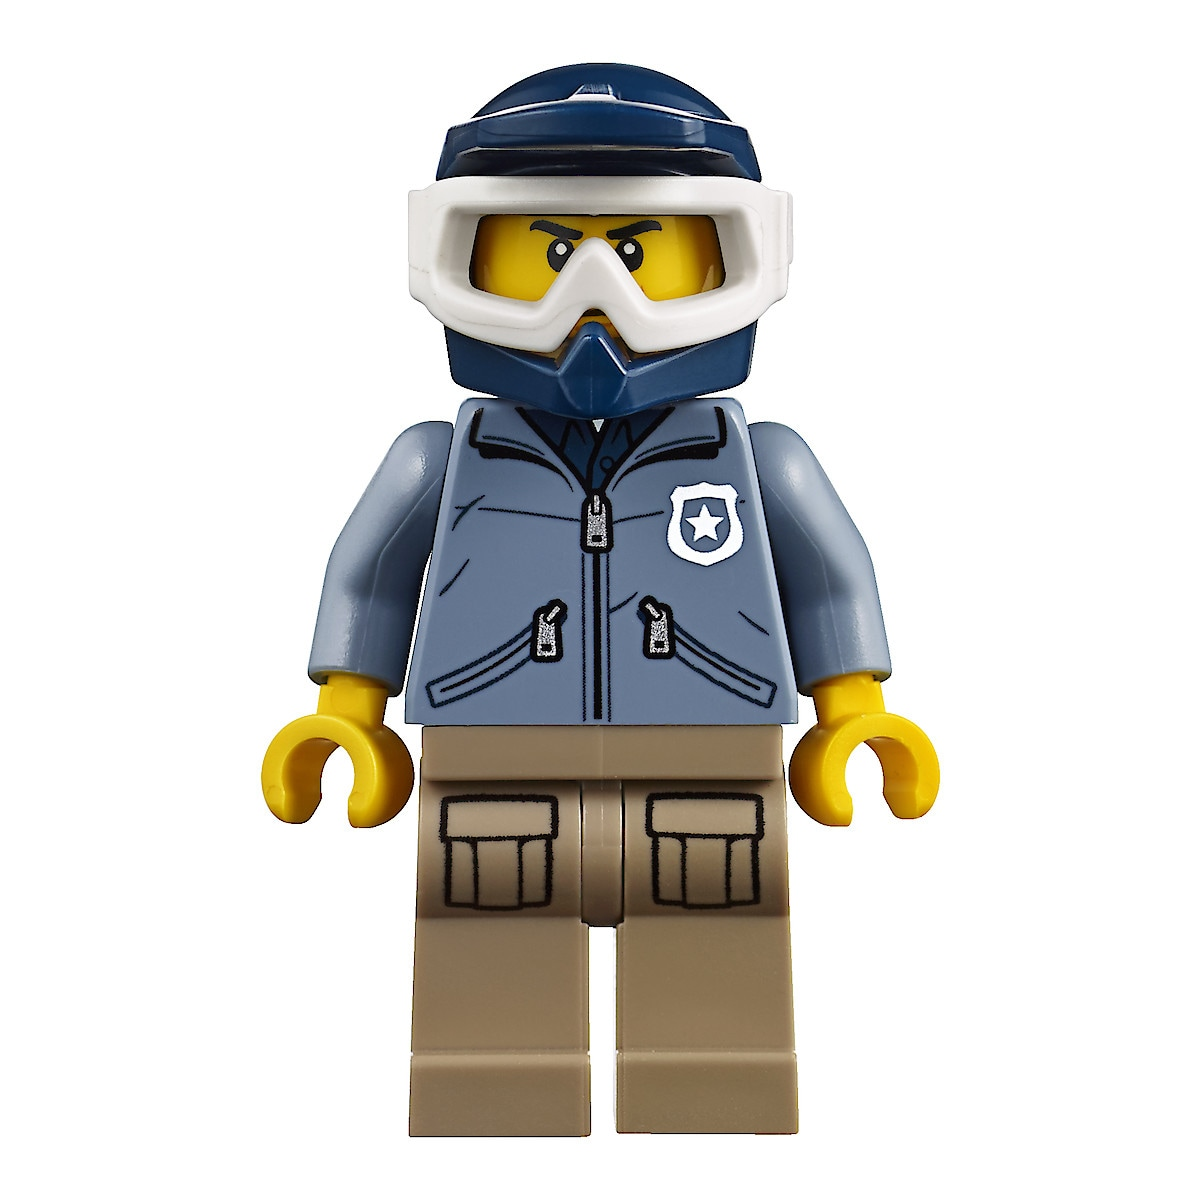 LEGO City Polizei 60170, Offroad-Verfolgungsjagd